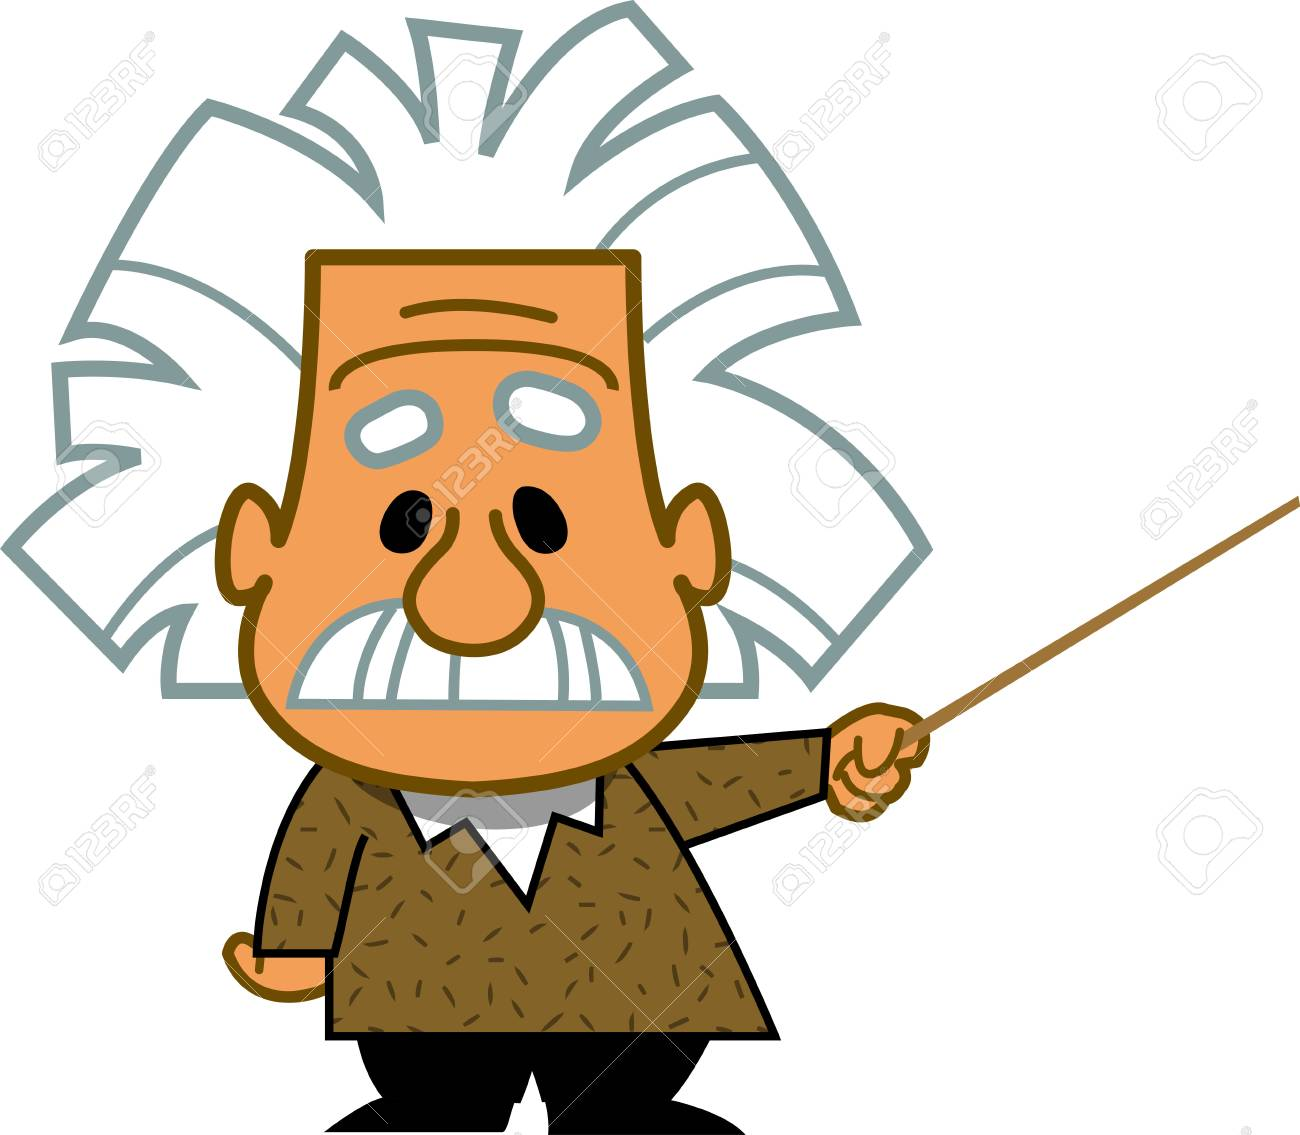 smart teacher professor genius scientist mathematician cartoon rh 123rf com royalty free clipart images for teachers